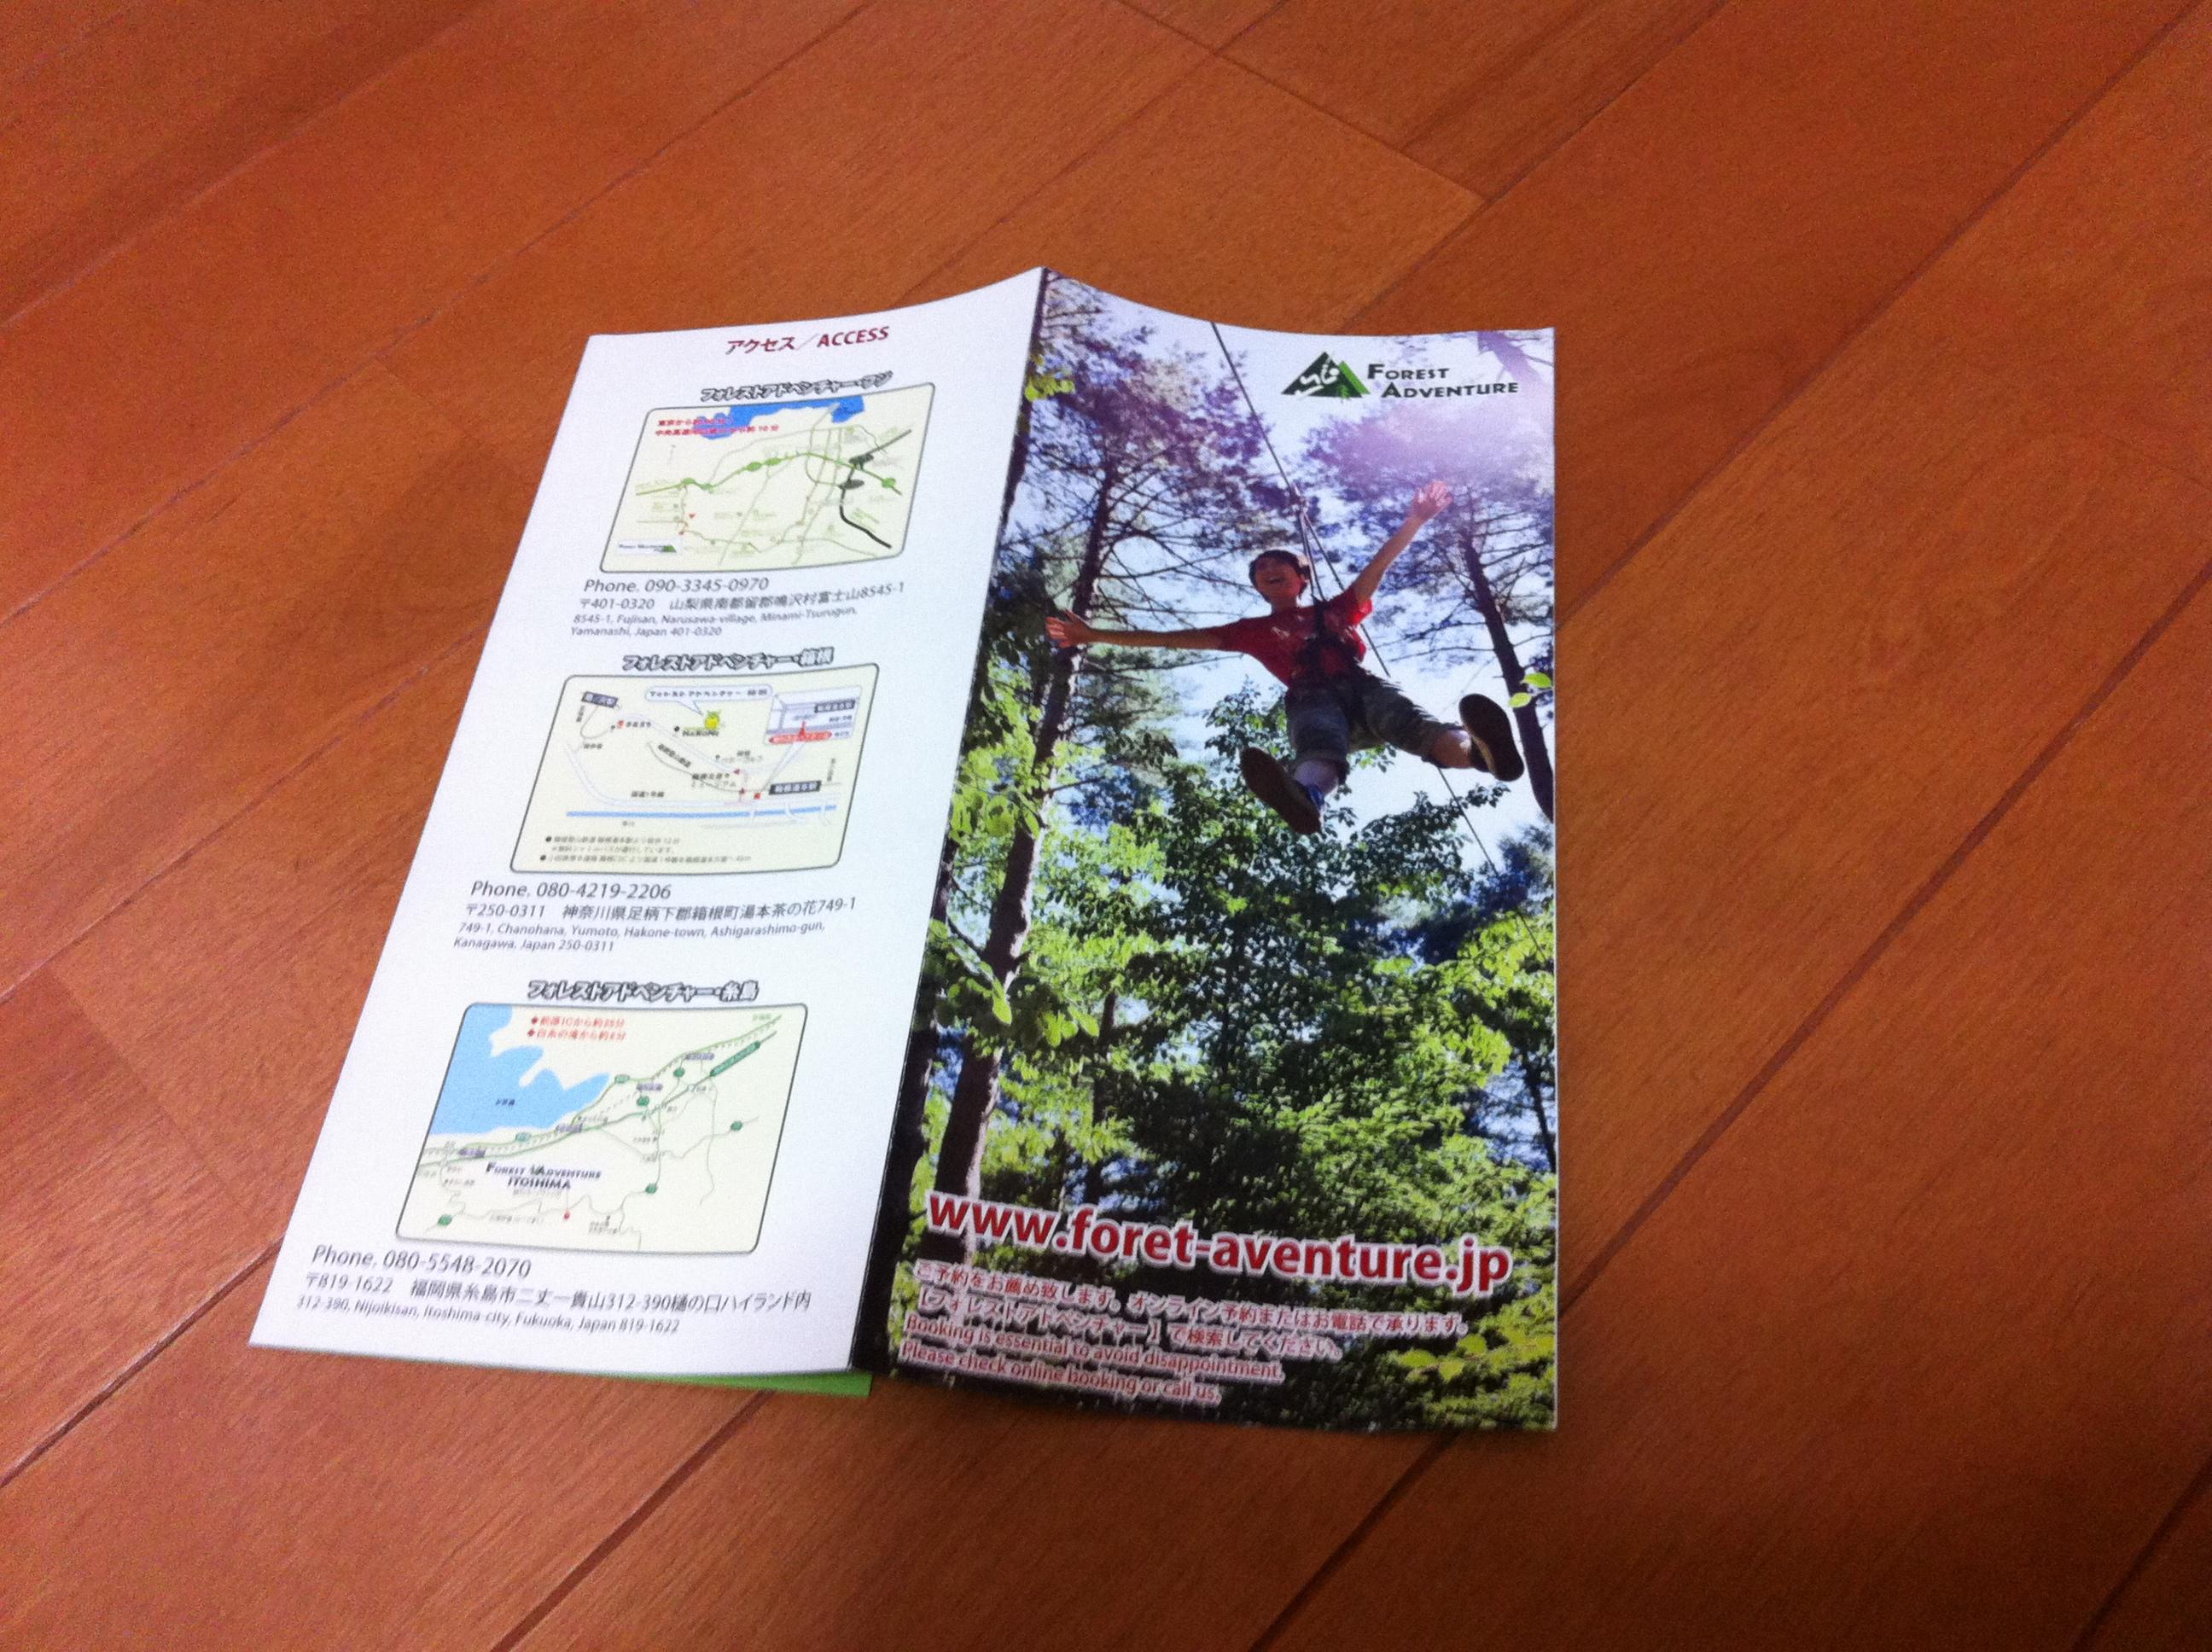 http://www.vantech.jp/shops/info/IMG_6819.JPG